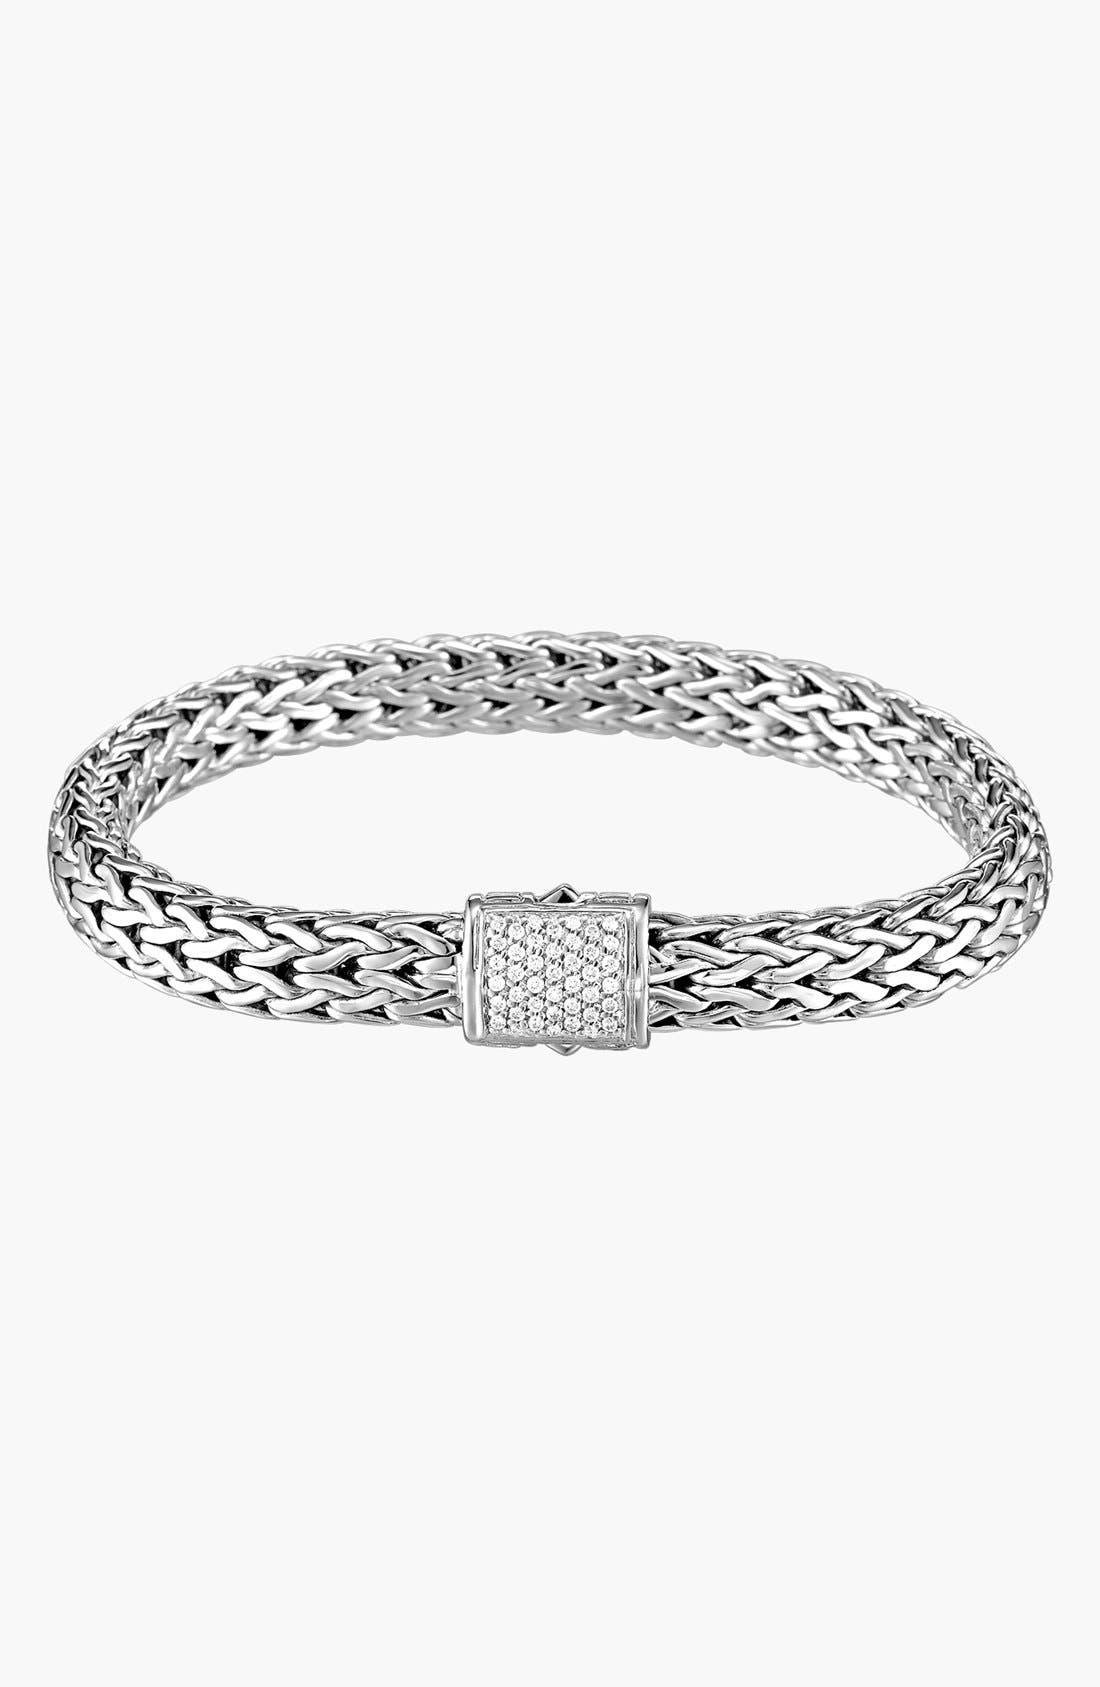 Main Image - John Hardy 'Classic Chain' Medium Pavé Diamond Bracelet